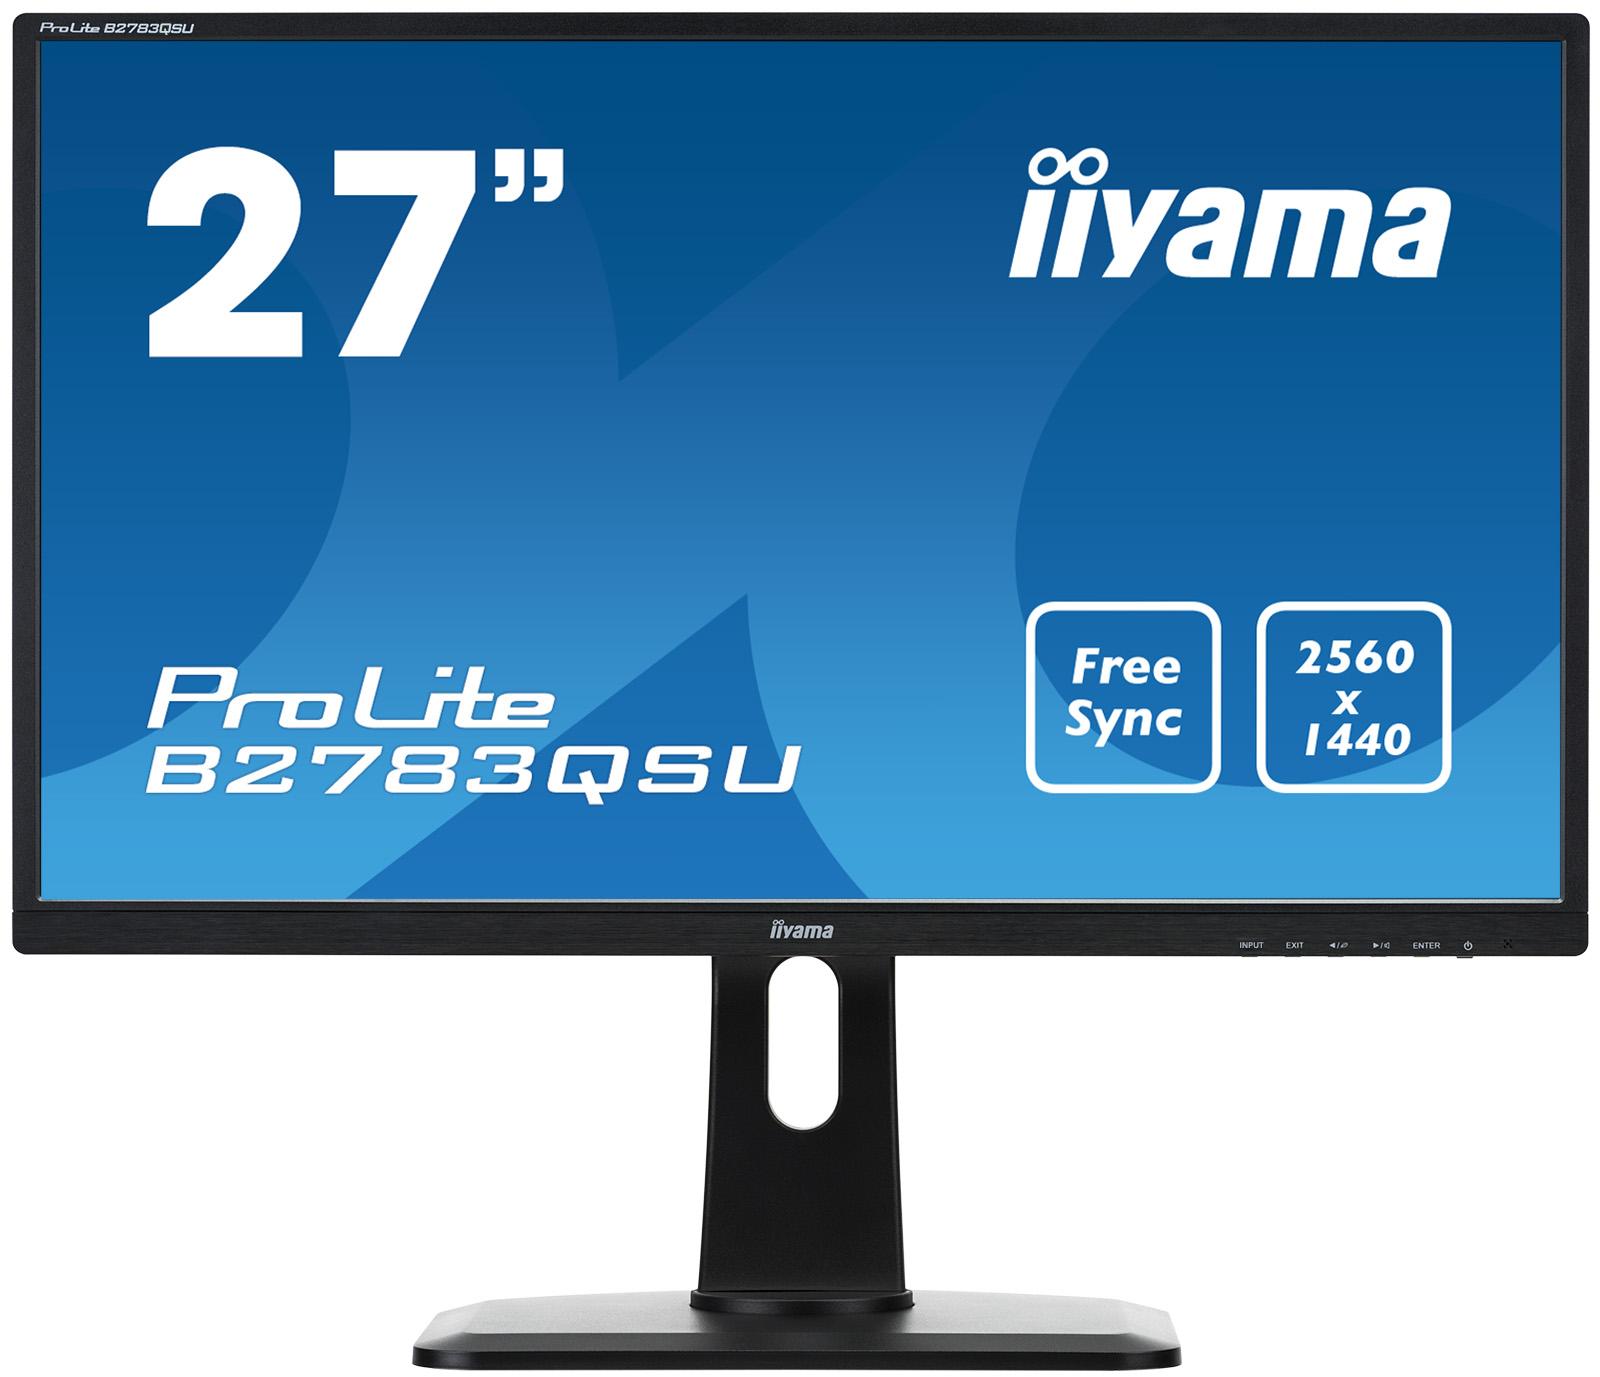 "27"" LCD iiyama B2783QSU-B1 -1ms,2560x1440,350cd,12M:1 ACR,DVI-D,HDMI,DP,USB,repro,pivot,výšk.nastav."